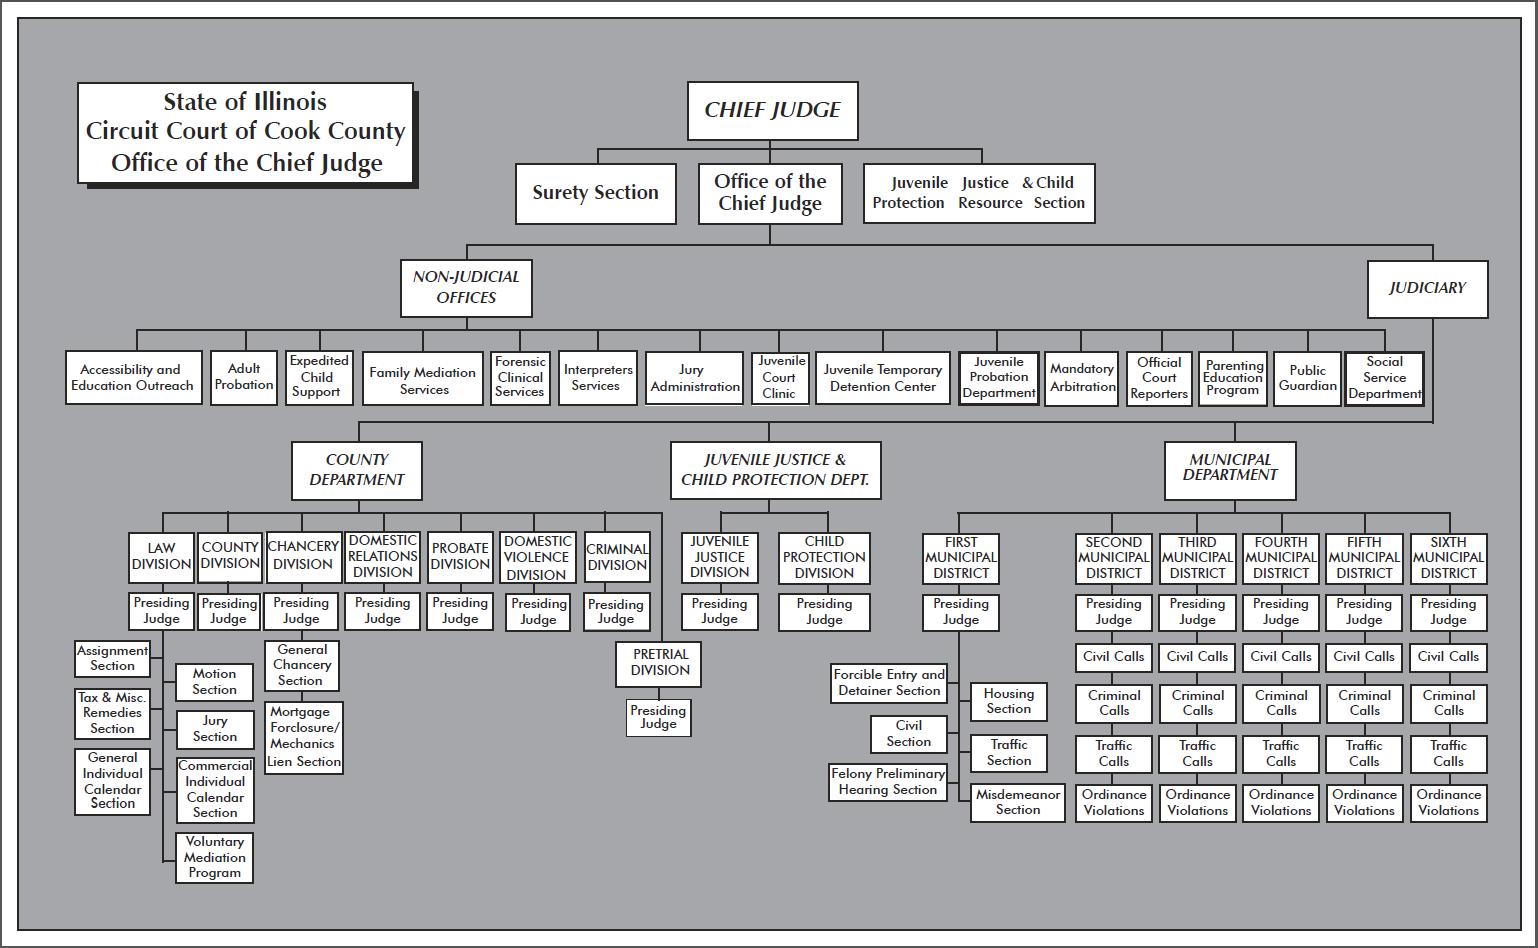 Organization Chart For Orange County Superior Court Departmental Calendar